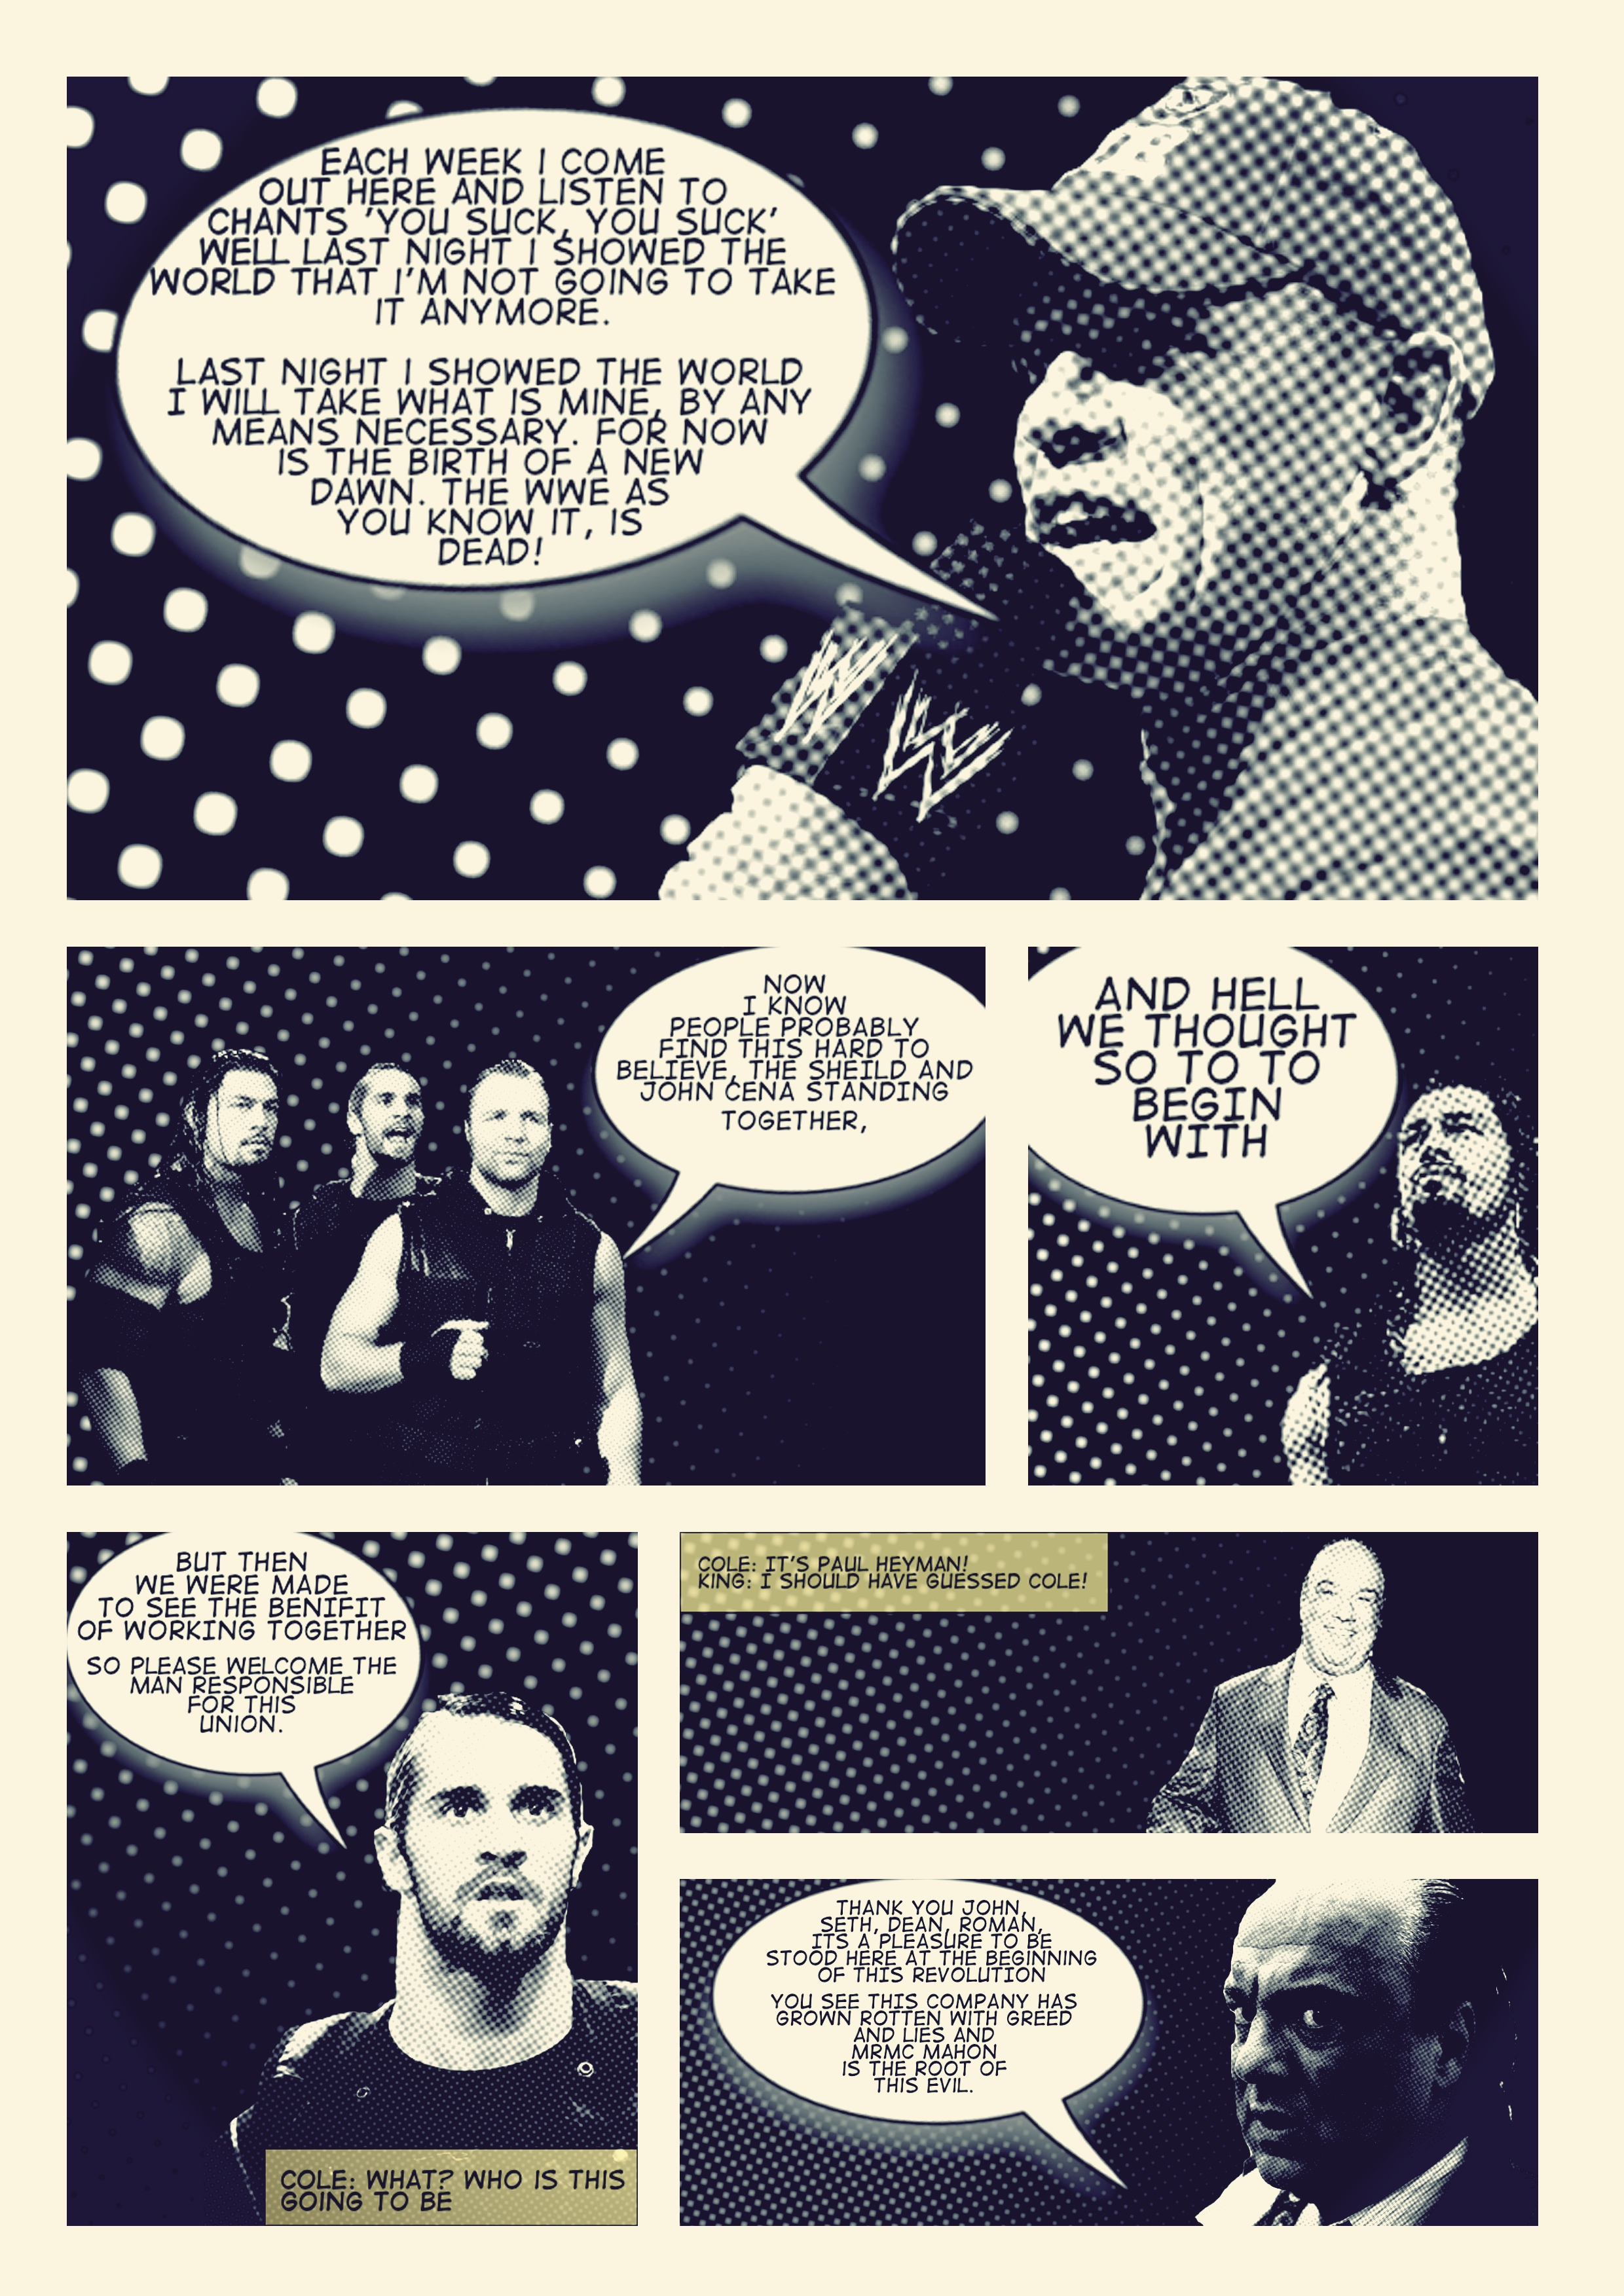 John Cena Quotes Wallpapers Dean Ambrose Wwecomic